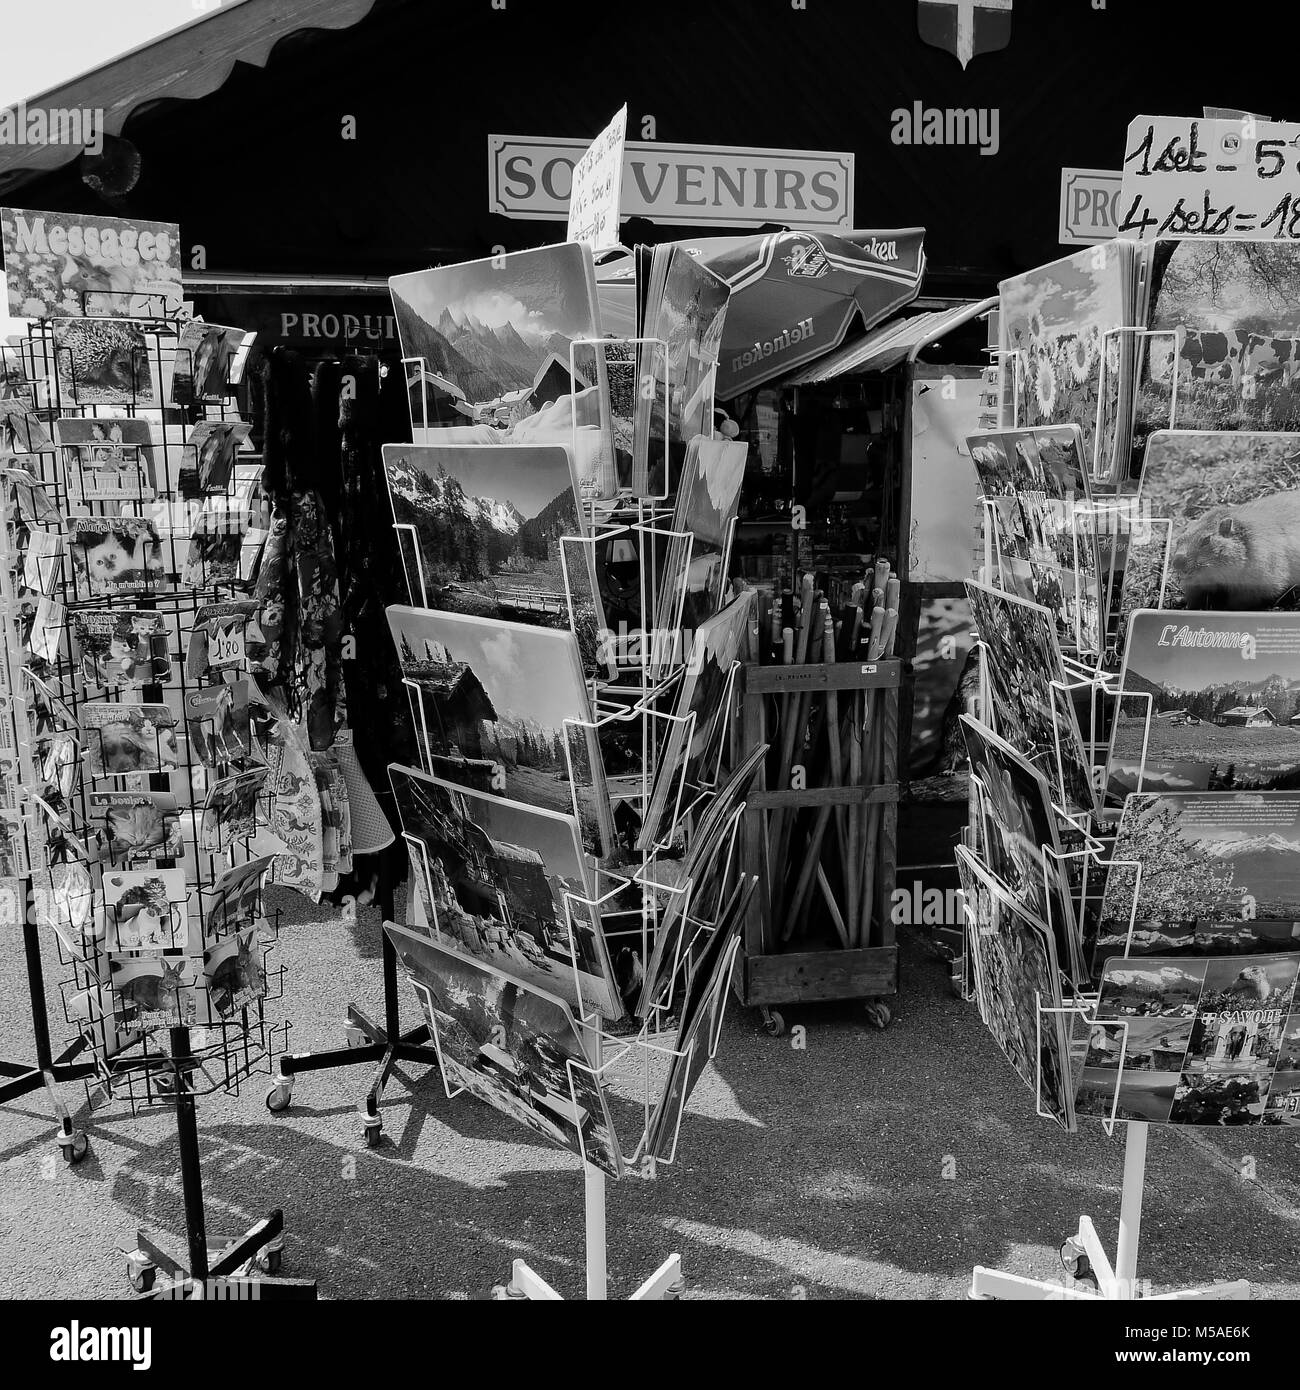 Souvenirs shop at Mount Revard, Savoy, France - Stock Image